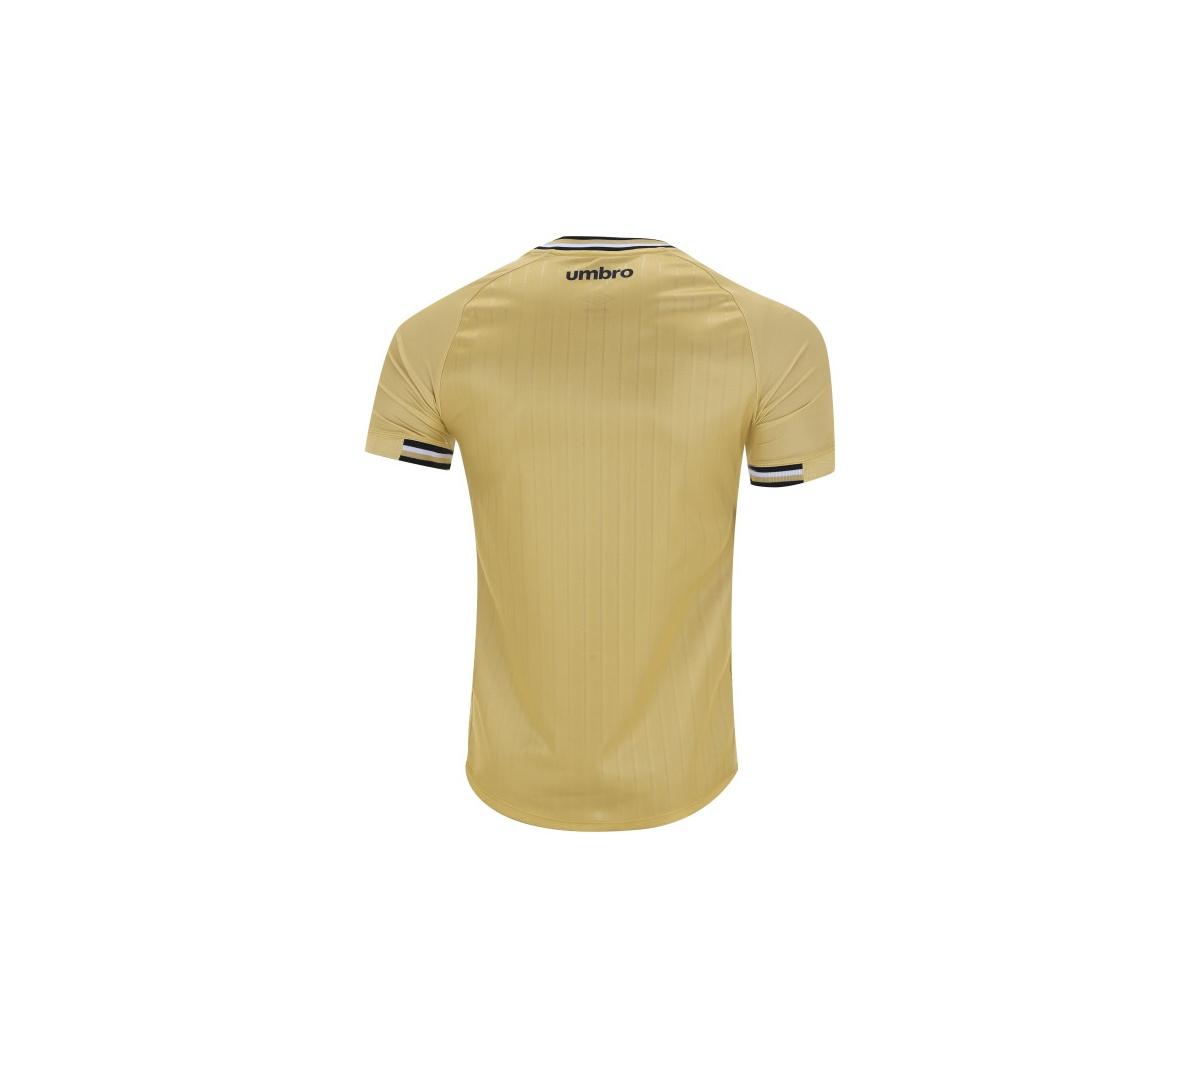 Camisa Umbro Santos III 2018/19.